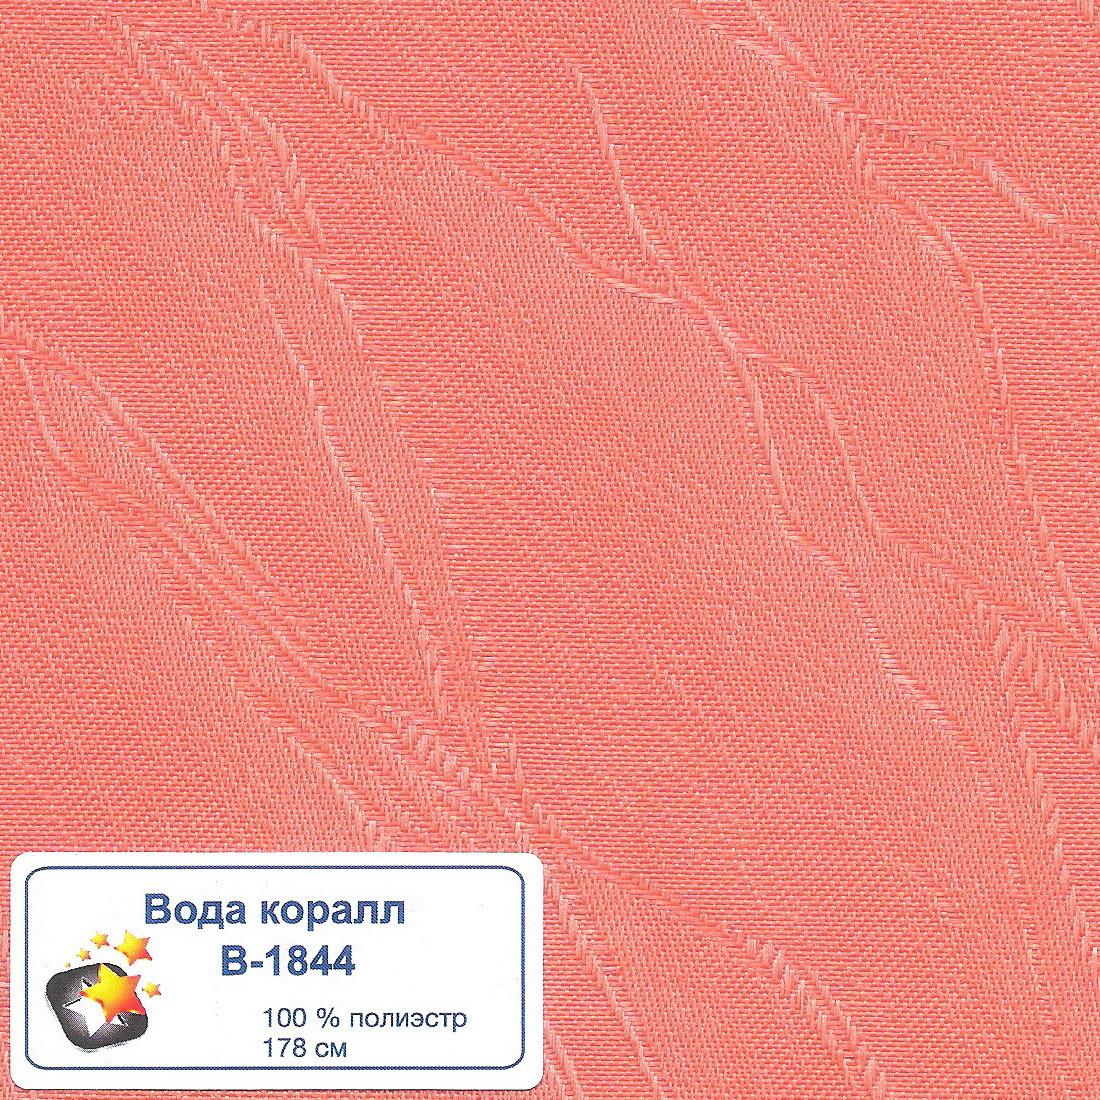 Рулонные шторы Ткань Вода 1844 Коралл